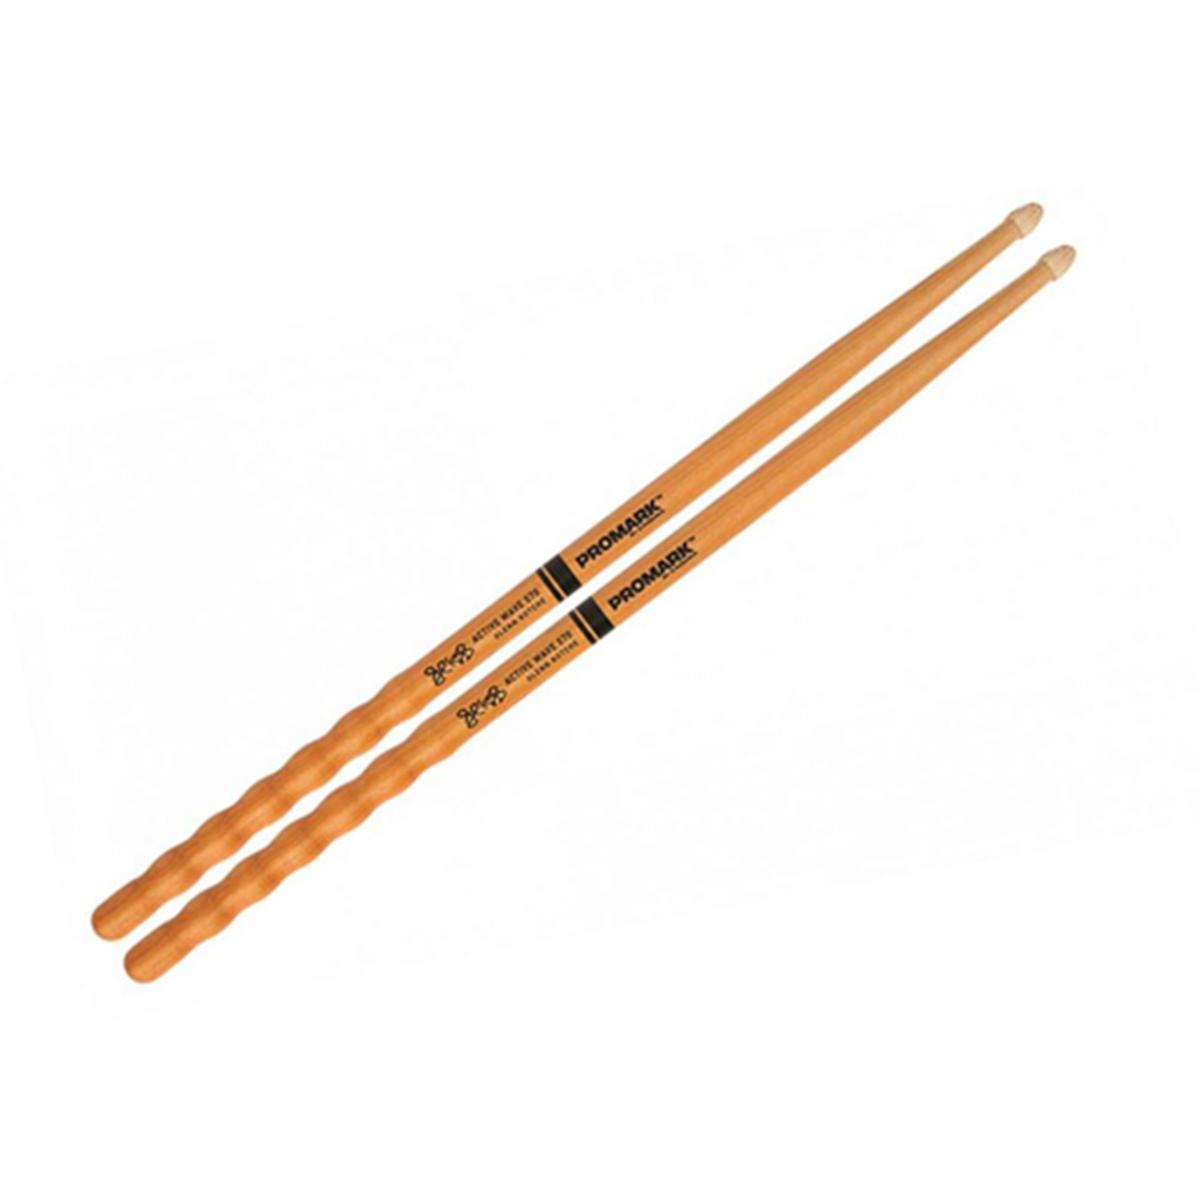 Zoom - Drum Sticks, Transparent background PNG HD thumbnail